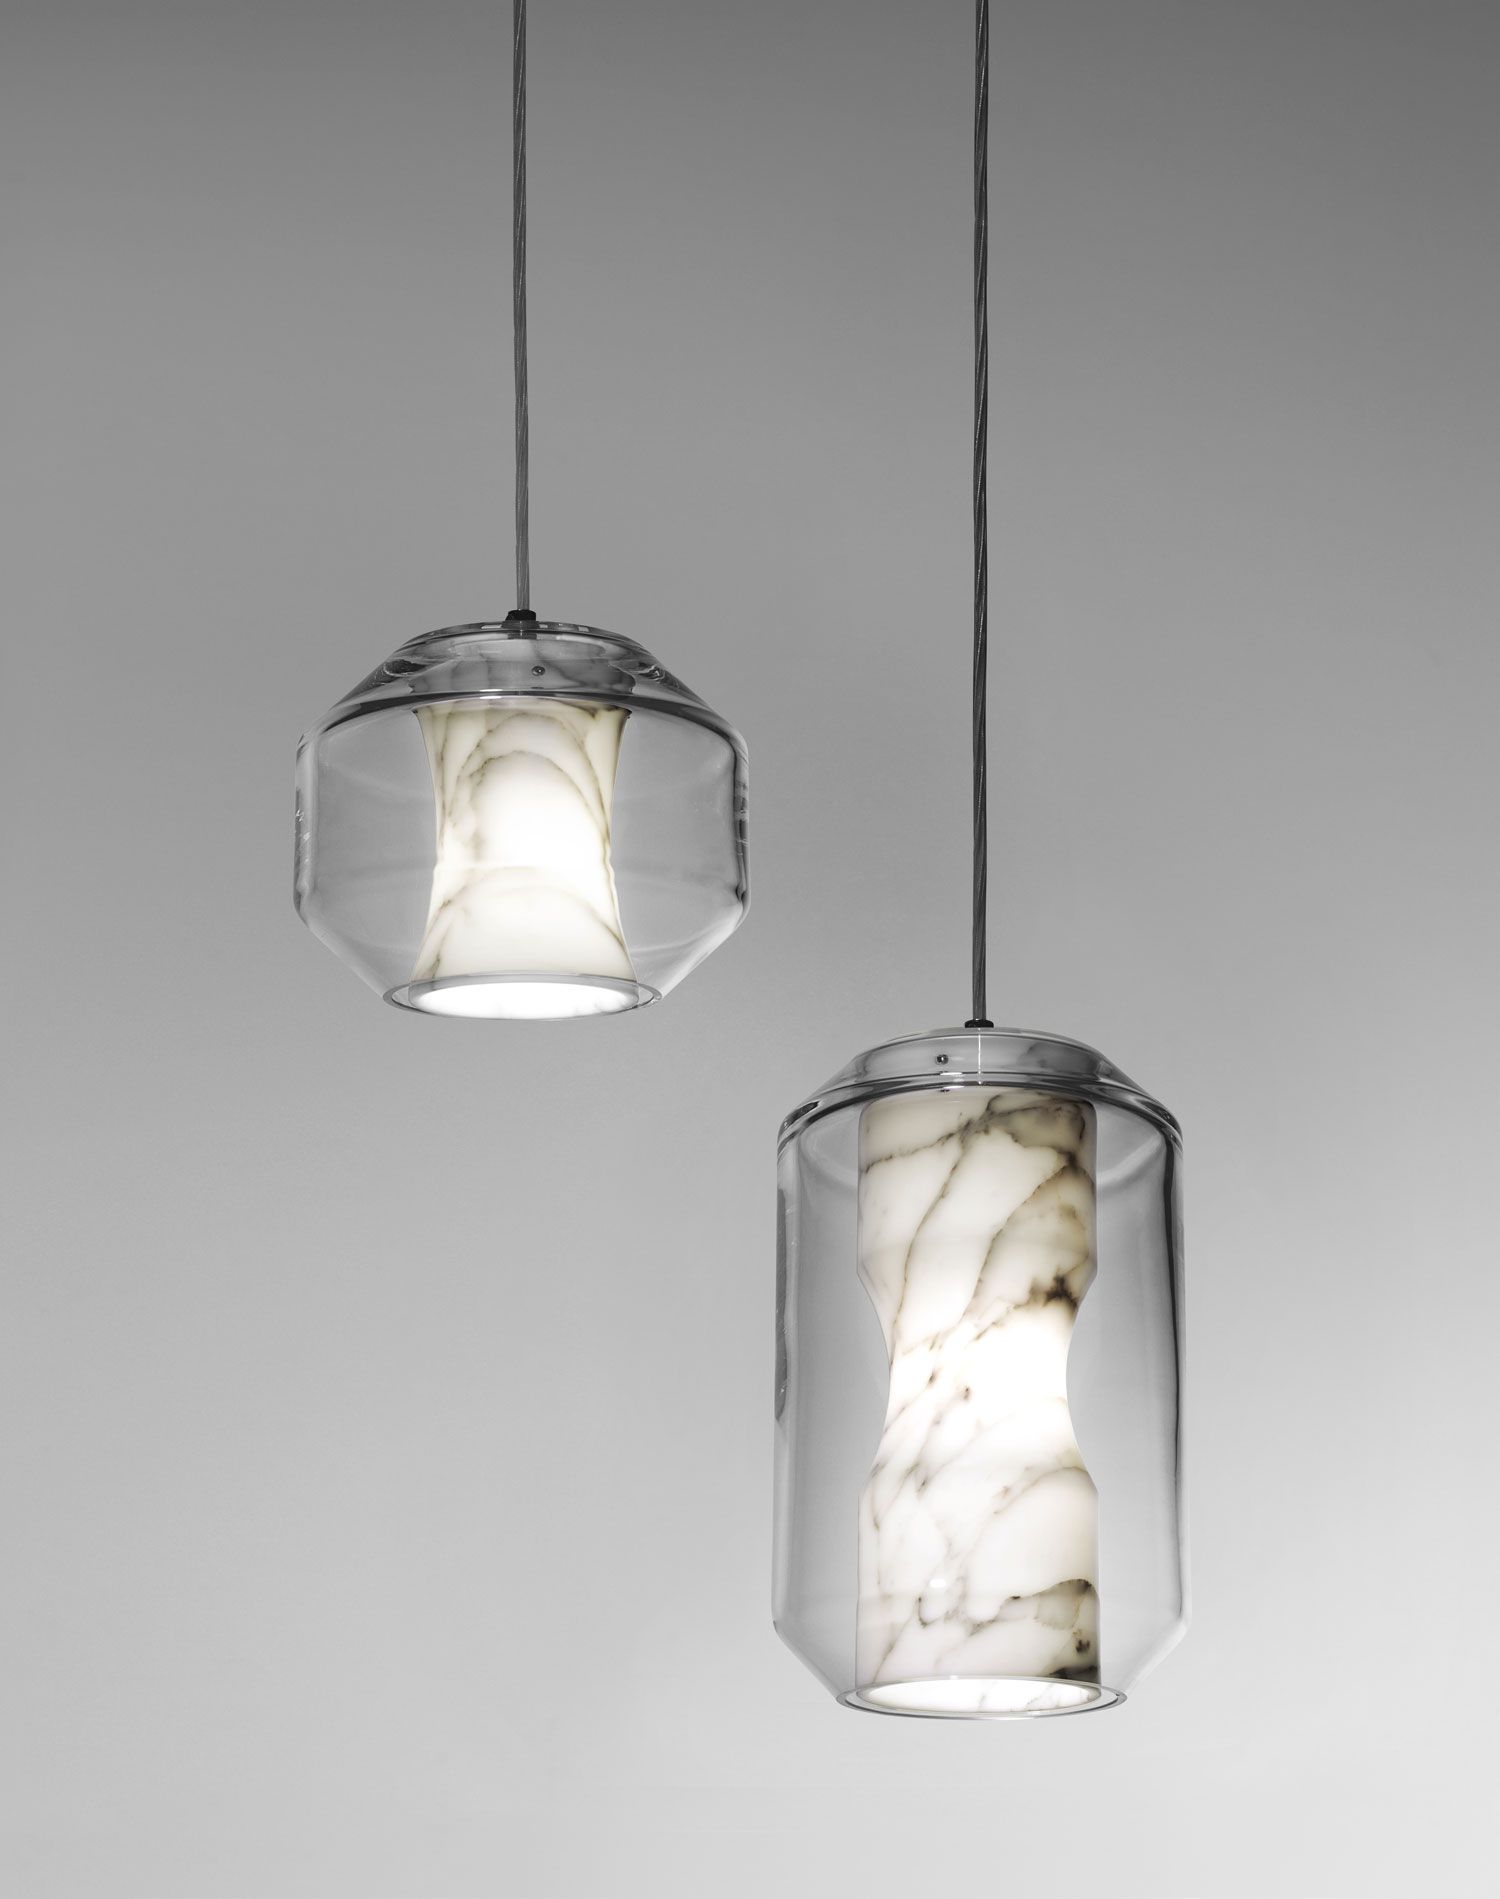 u0027Chamber Lightu0027 Nouveau Rebel Collection by Lee Broom & London Design Week: New Product Roundup | Lees Industrial design ... azcodes.com